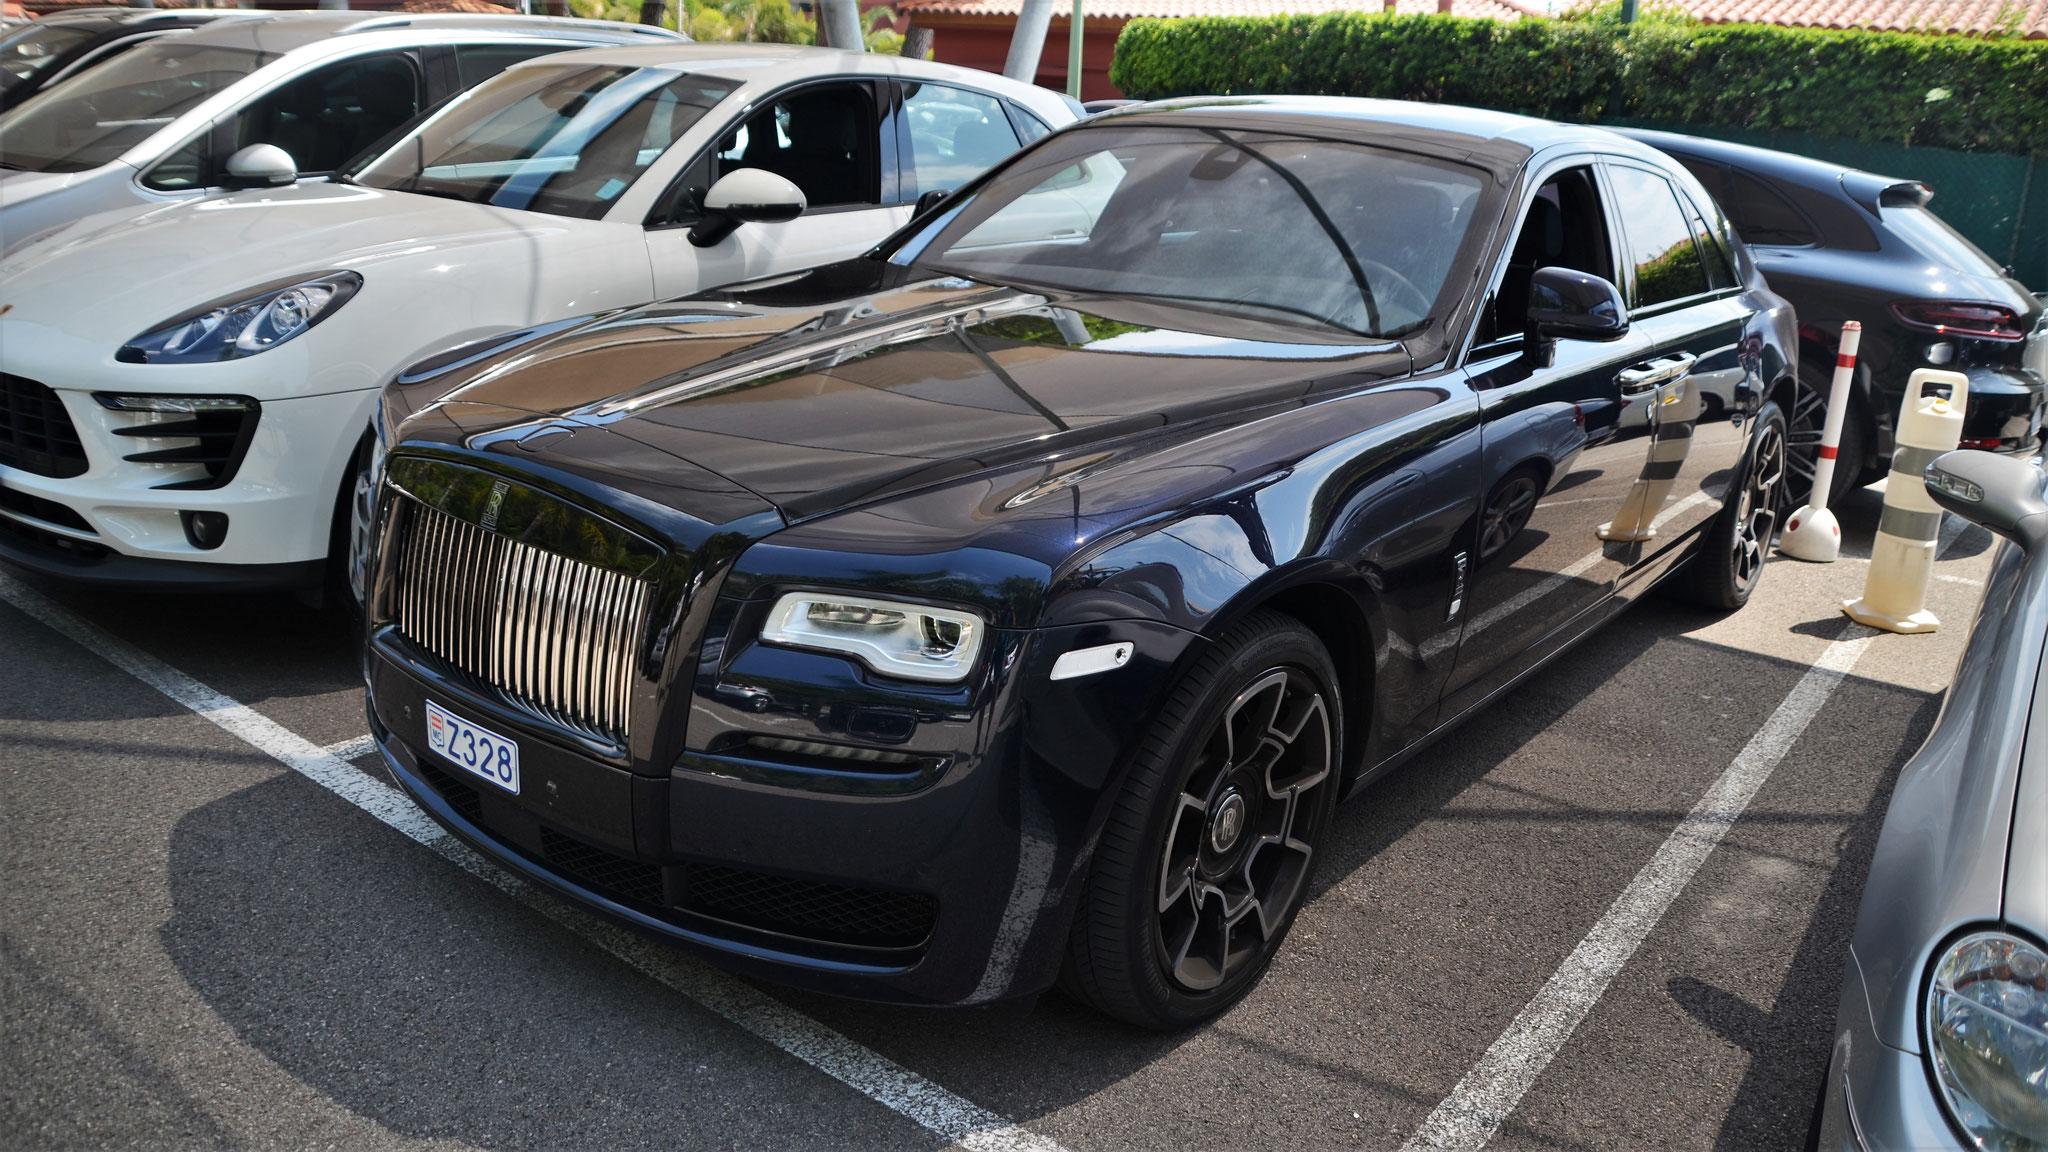 Rolls Royce Ghost Series II Black Badge - Z328 (MC)